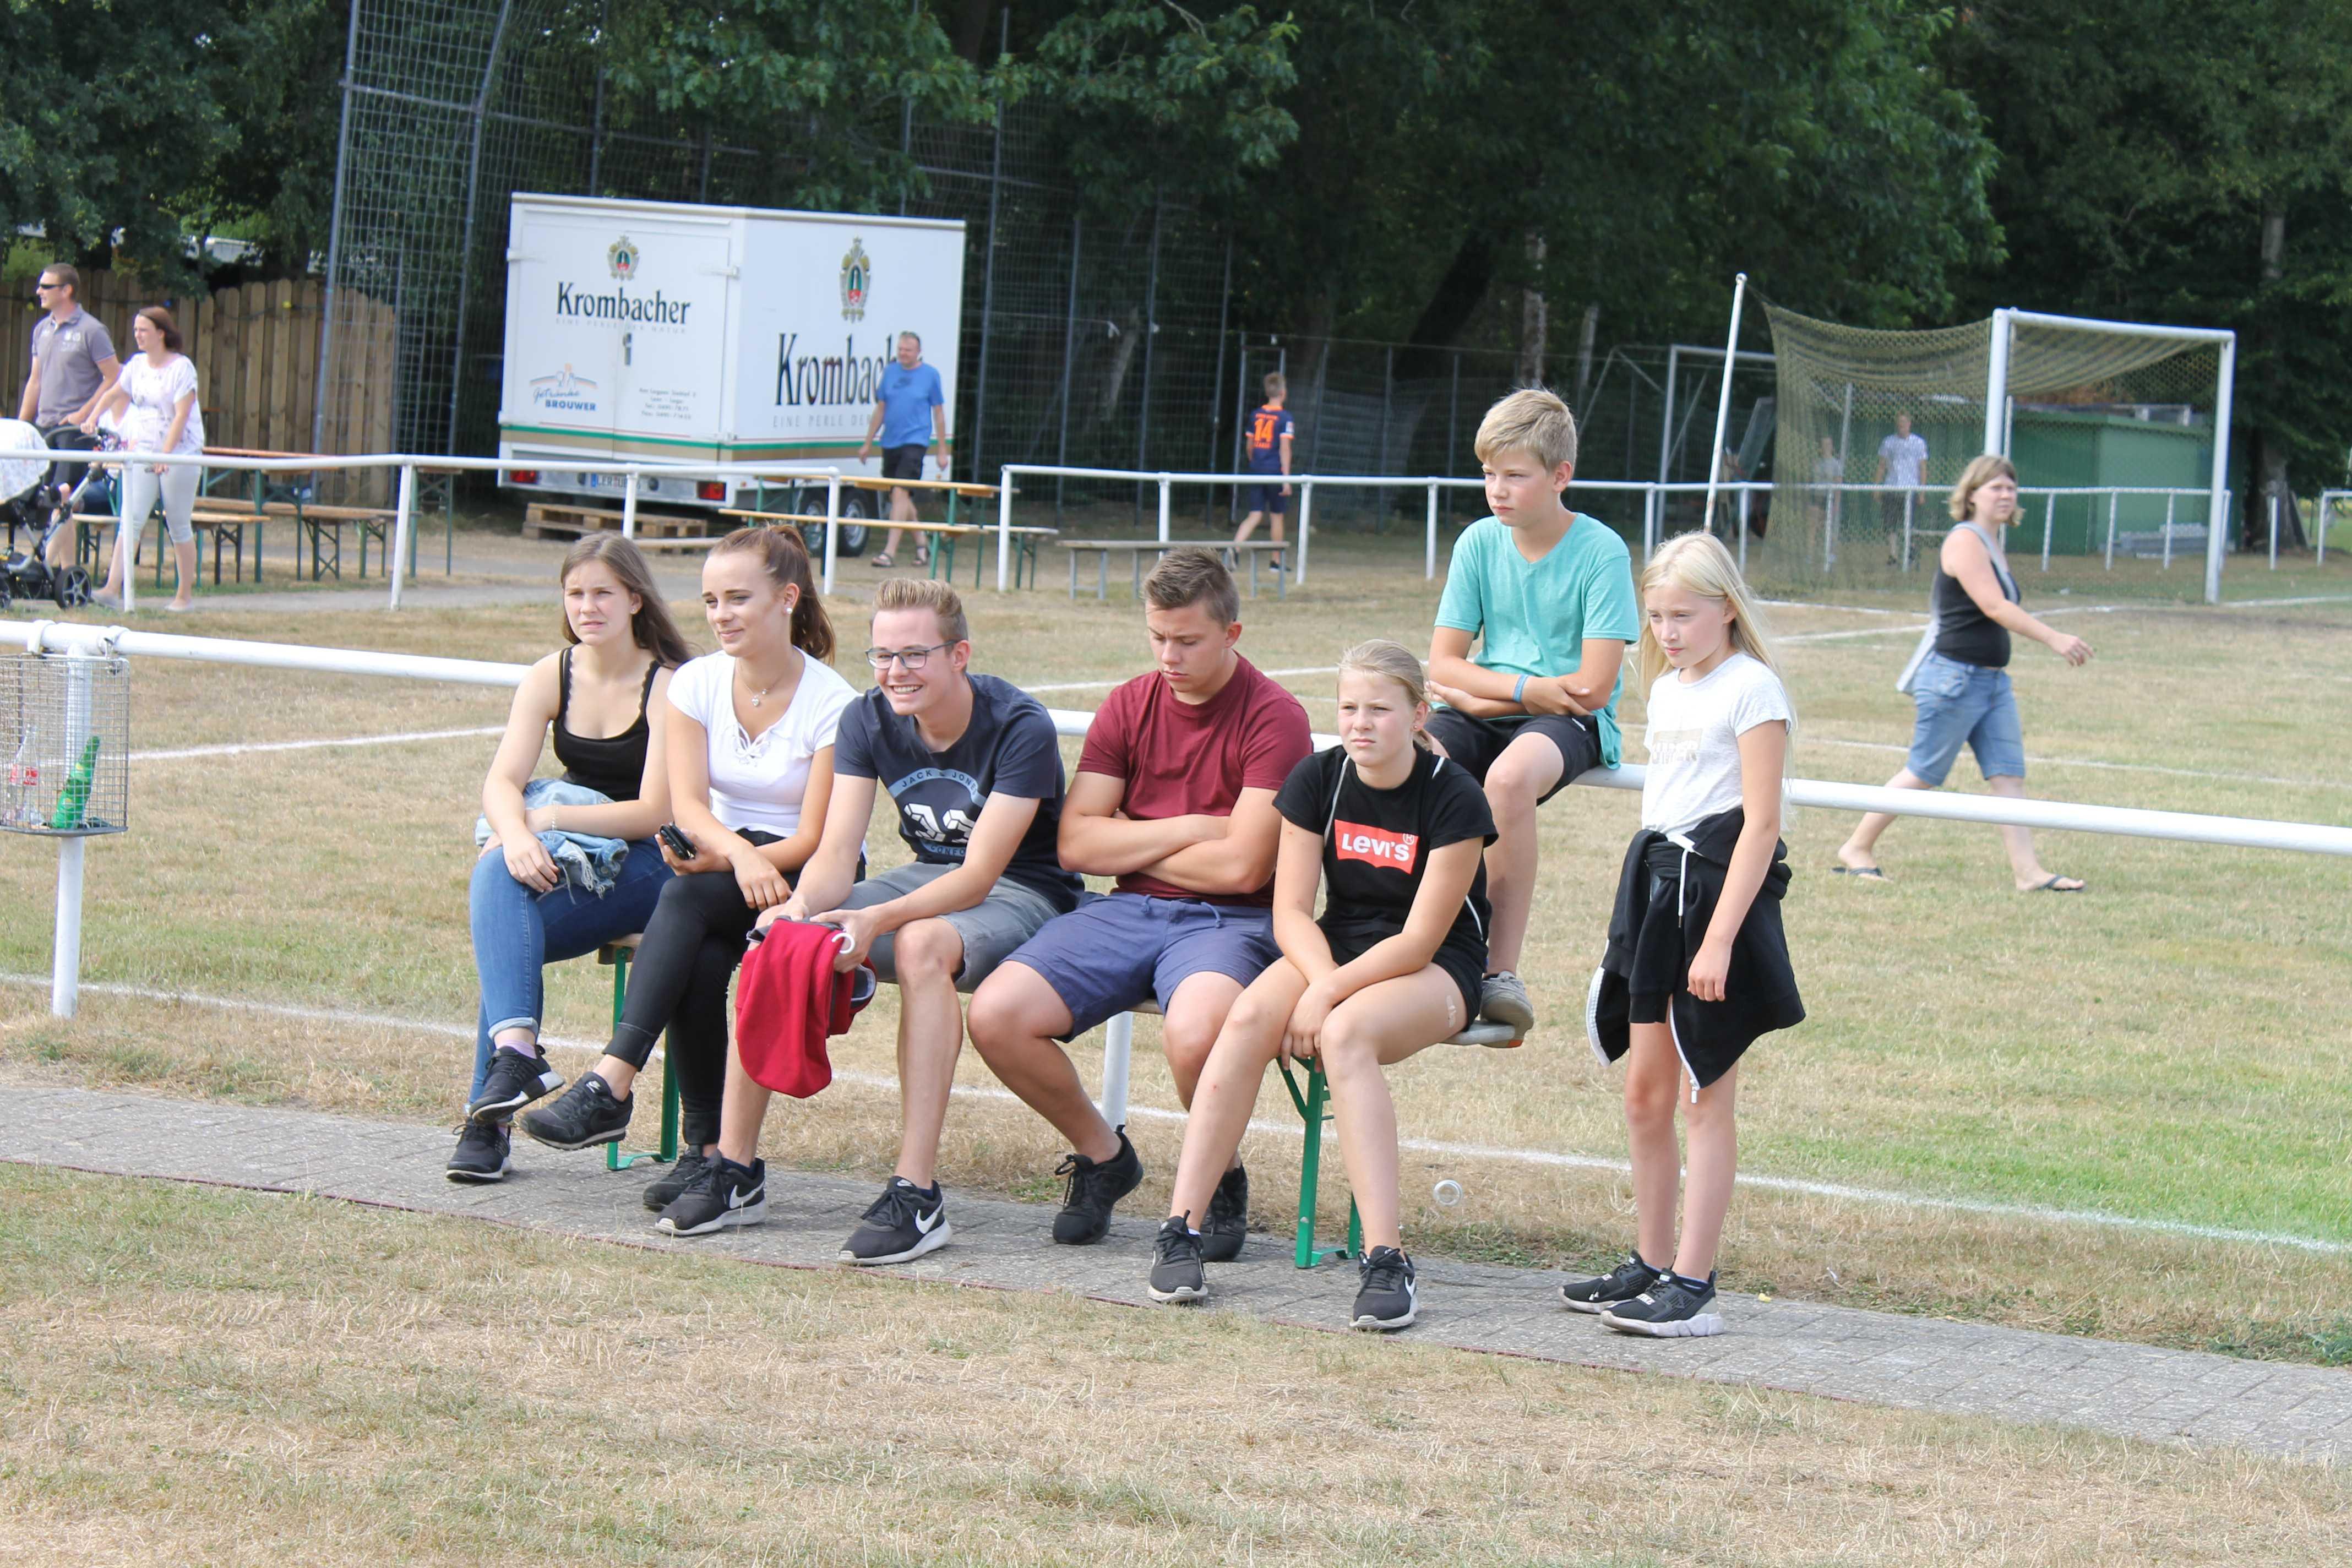 2018-07-29 Sportwoche - Sportpicknick & Football & Fußball (46)